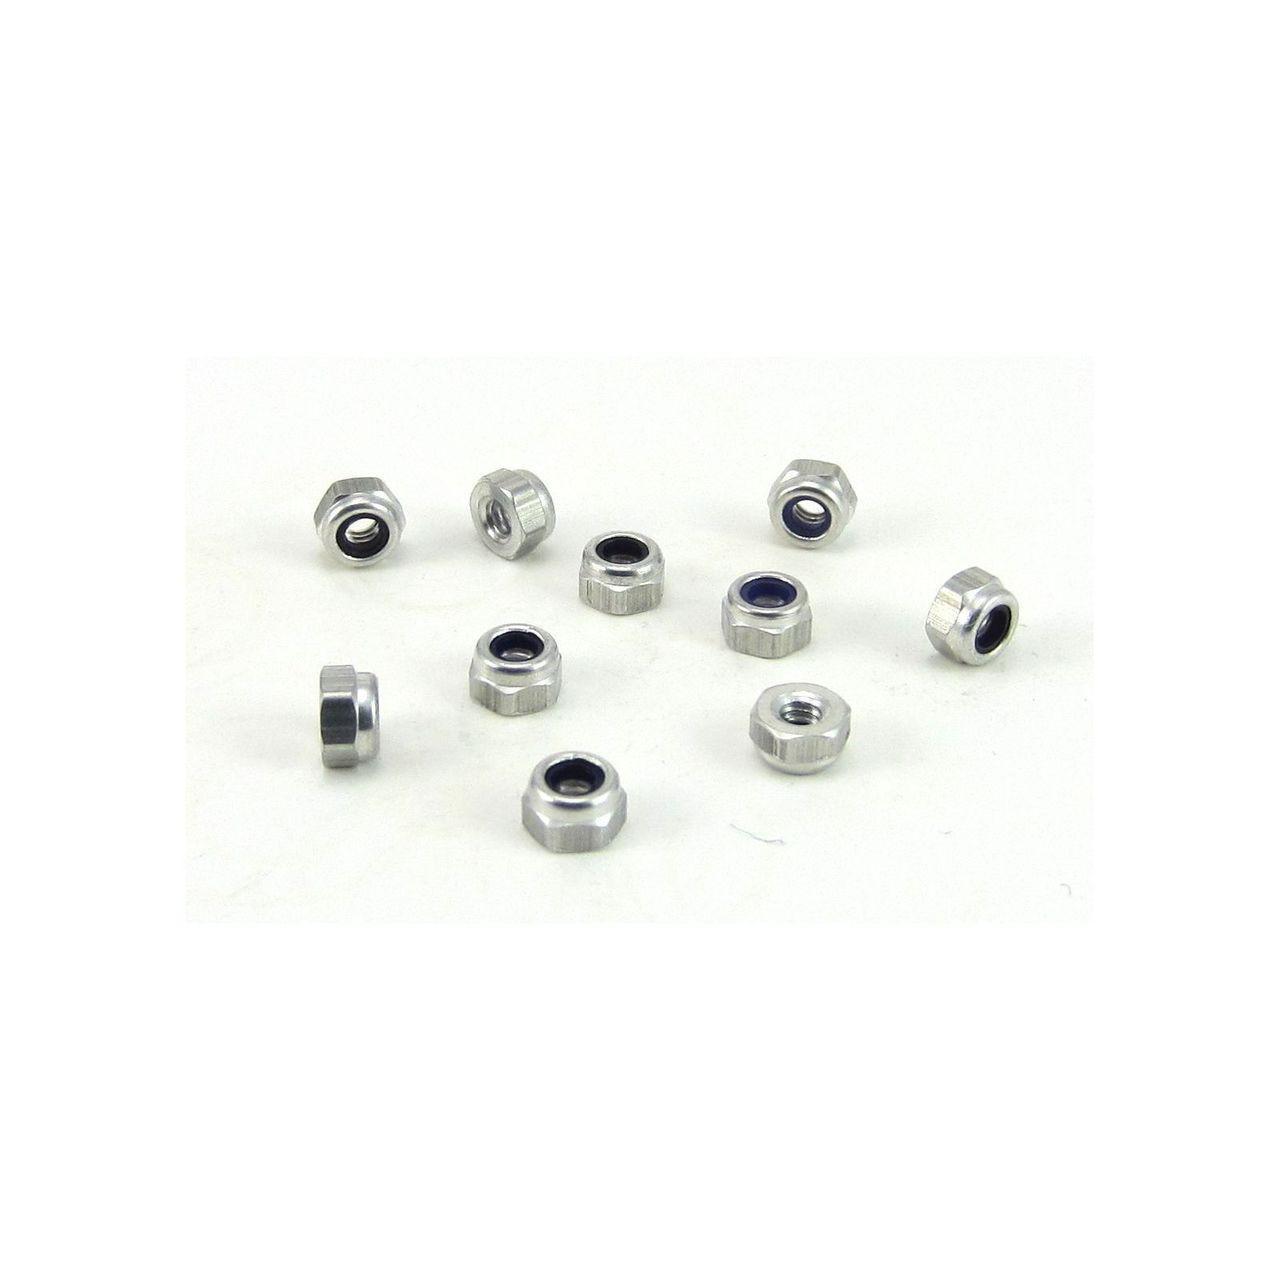 TRB RC 2-56 Aluminum Hex Locknut Nylon Insert 5/32 Hex (10)